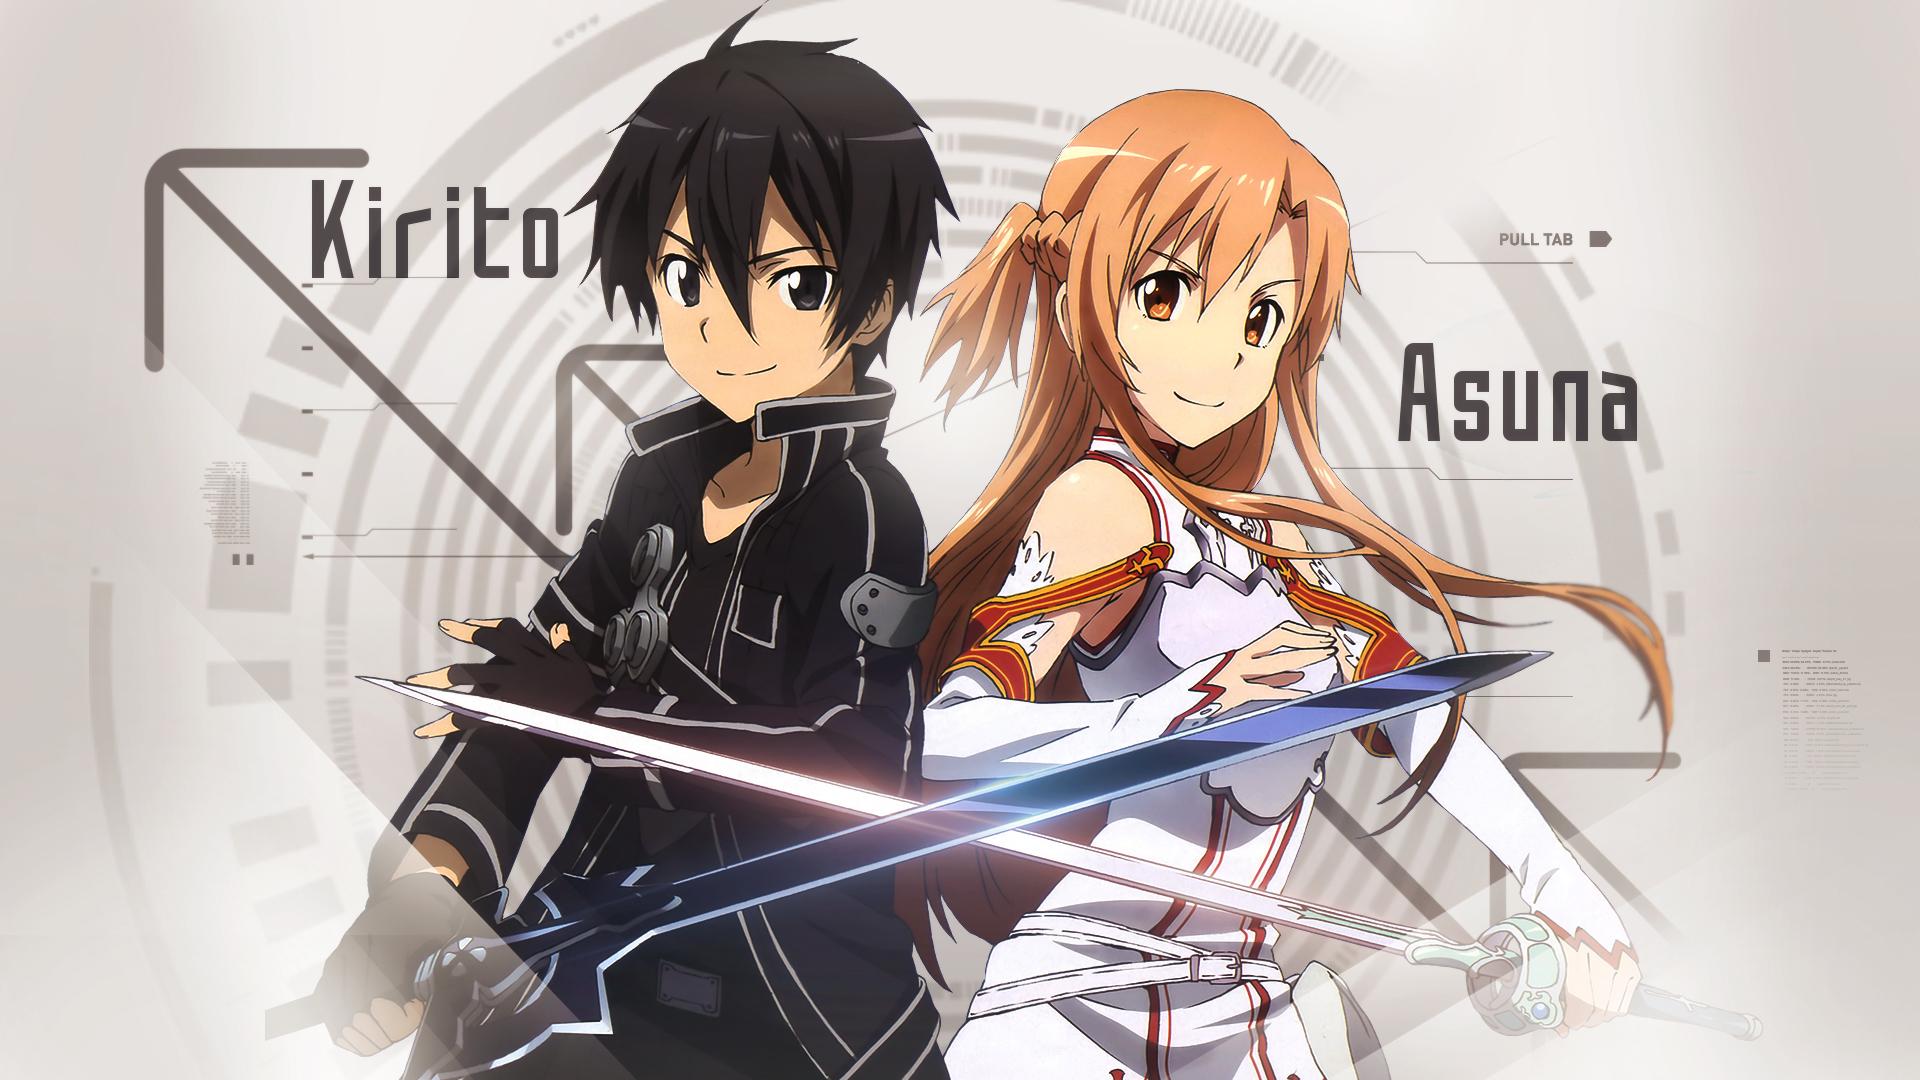 Sword Art Online Kirito And Asuna Wallpaper By Trinexz On Deviantart